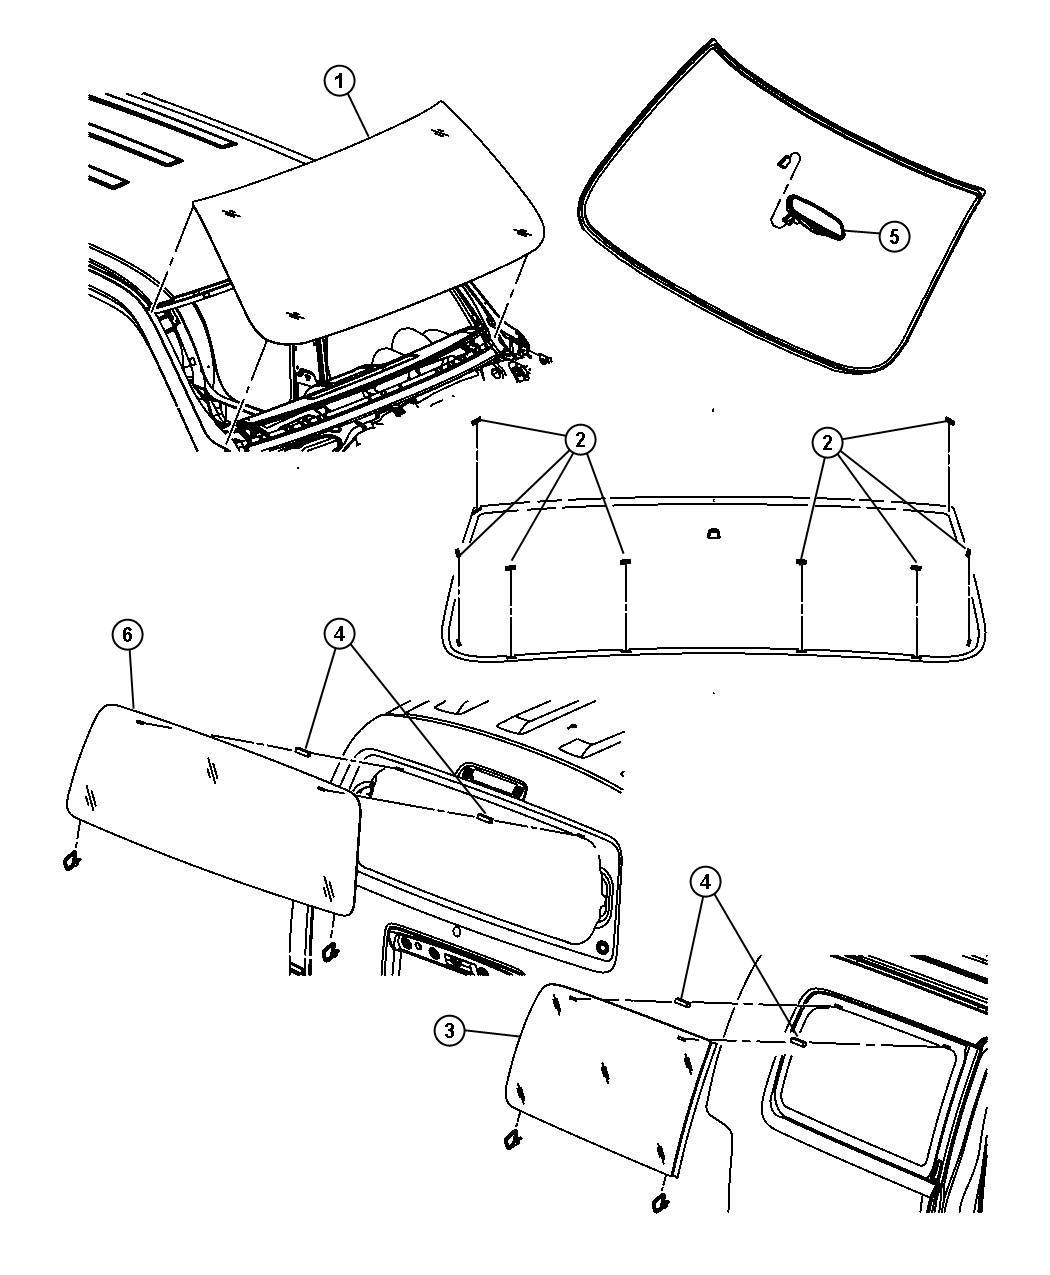 2007 Dodge NITRO Backlite. [gam], solar tint [gam], with